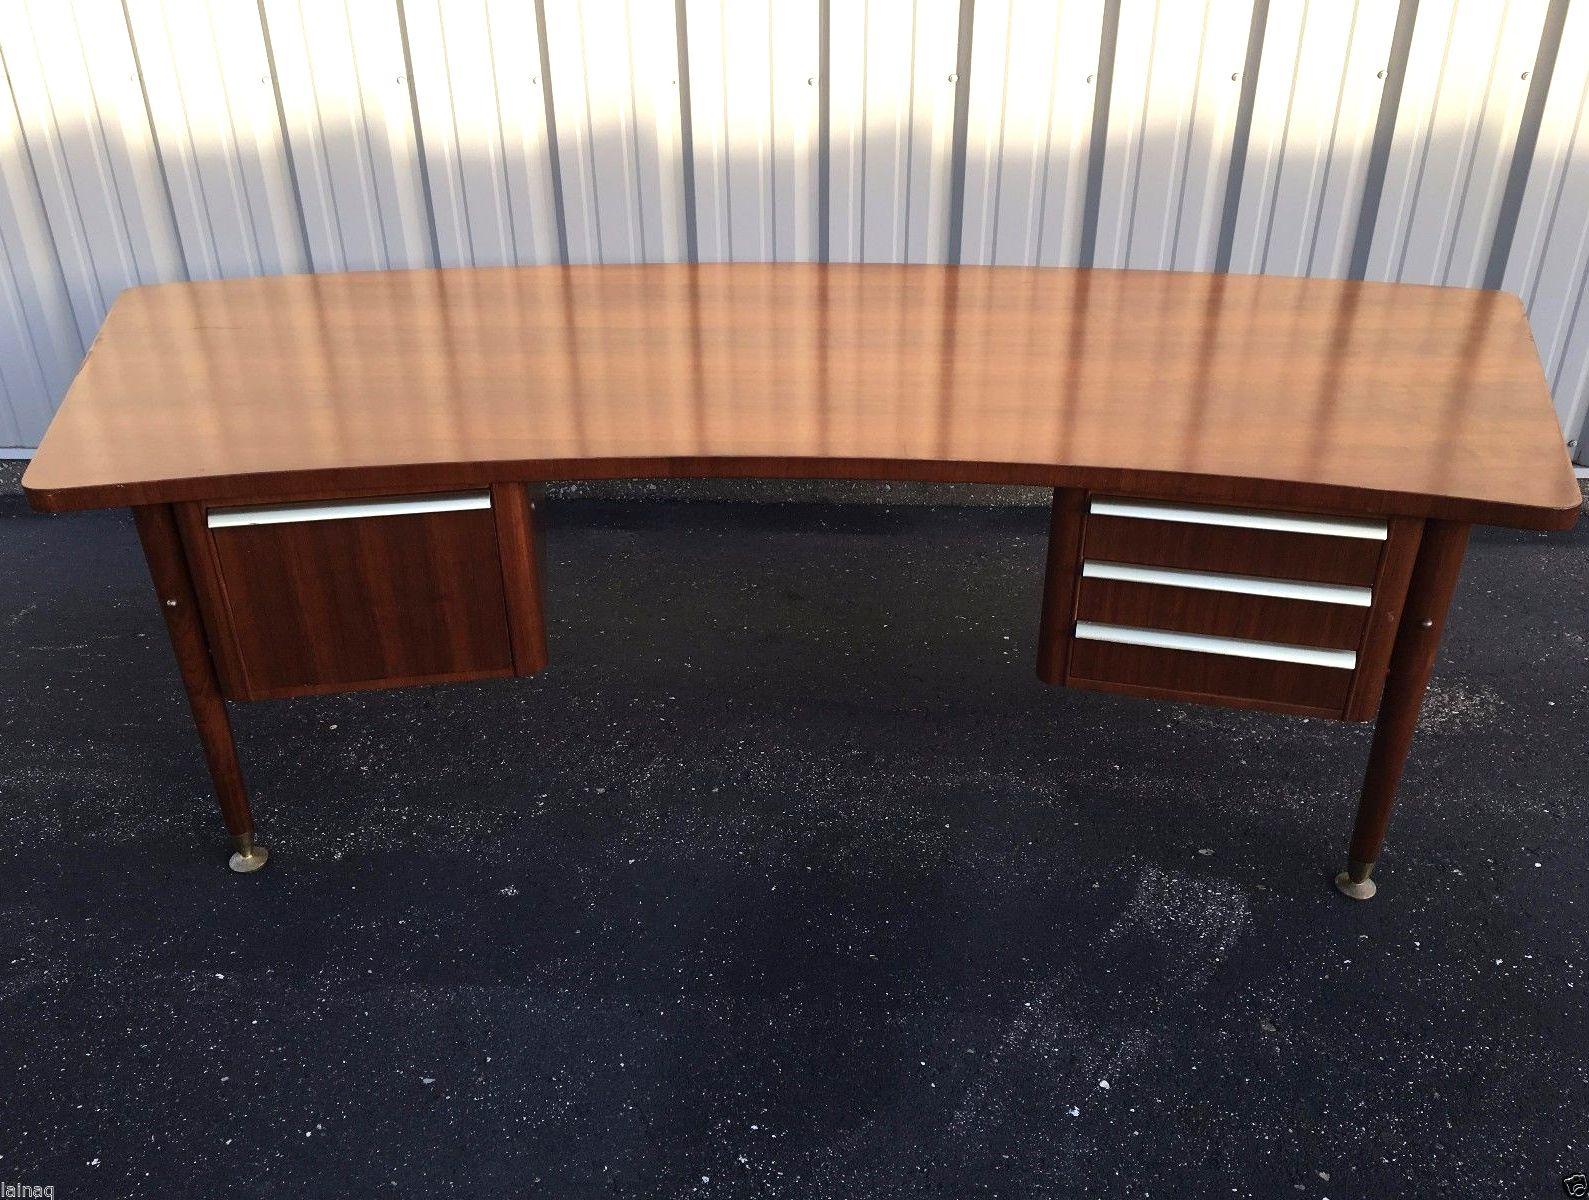 Stow Davis Curved Teak Desk. Davis FurnitureTeak